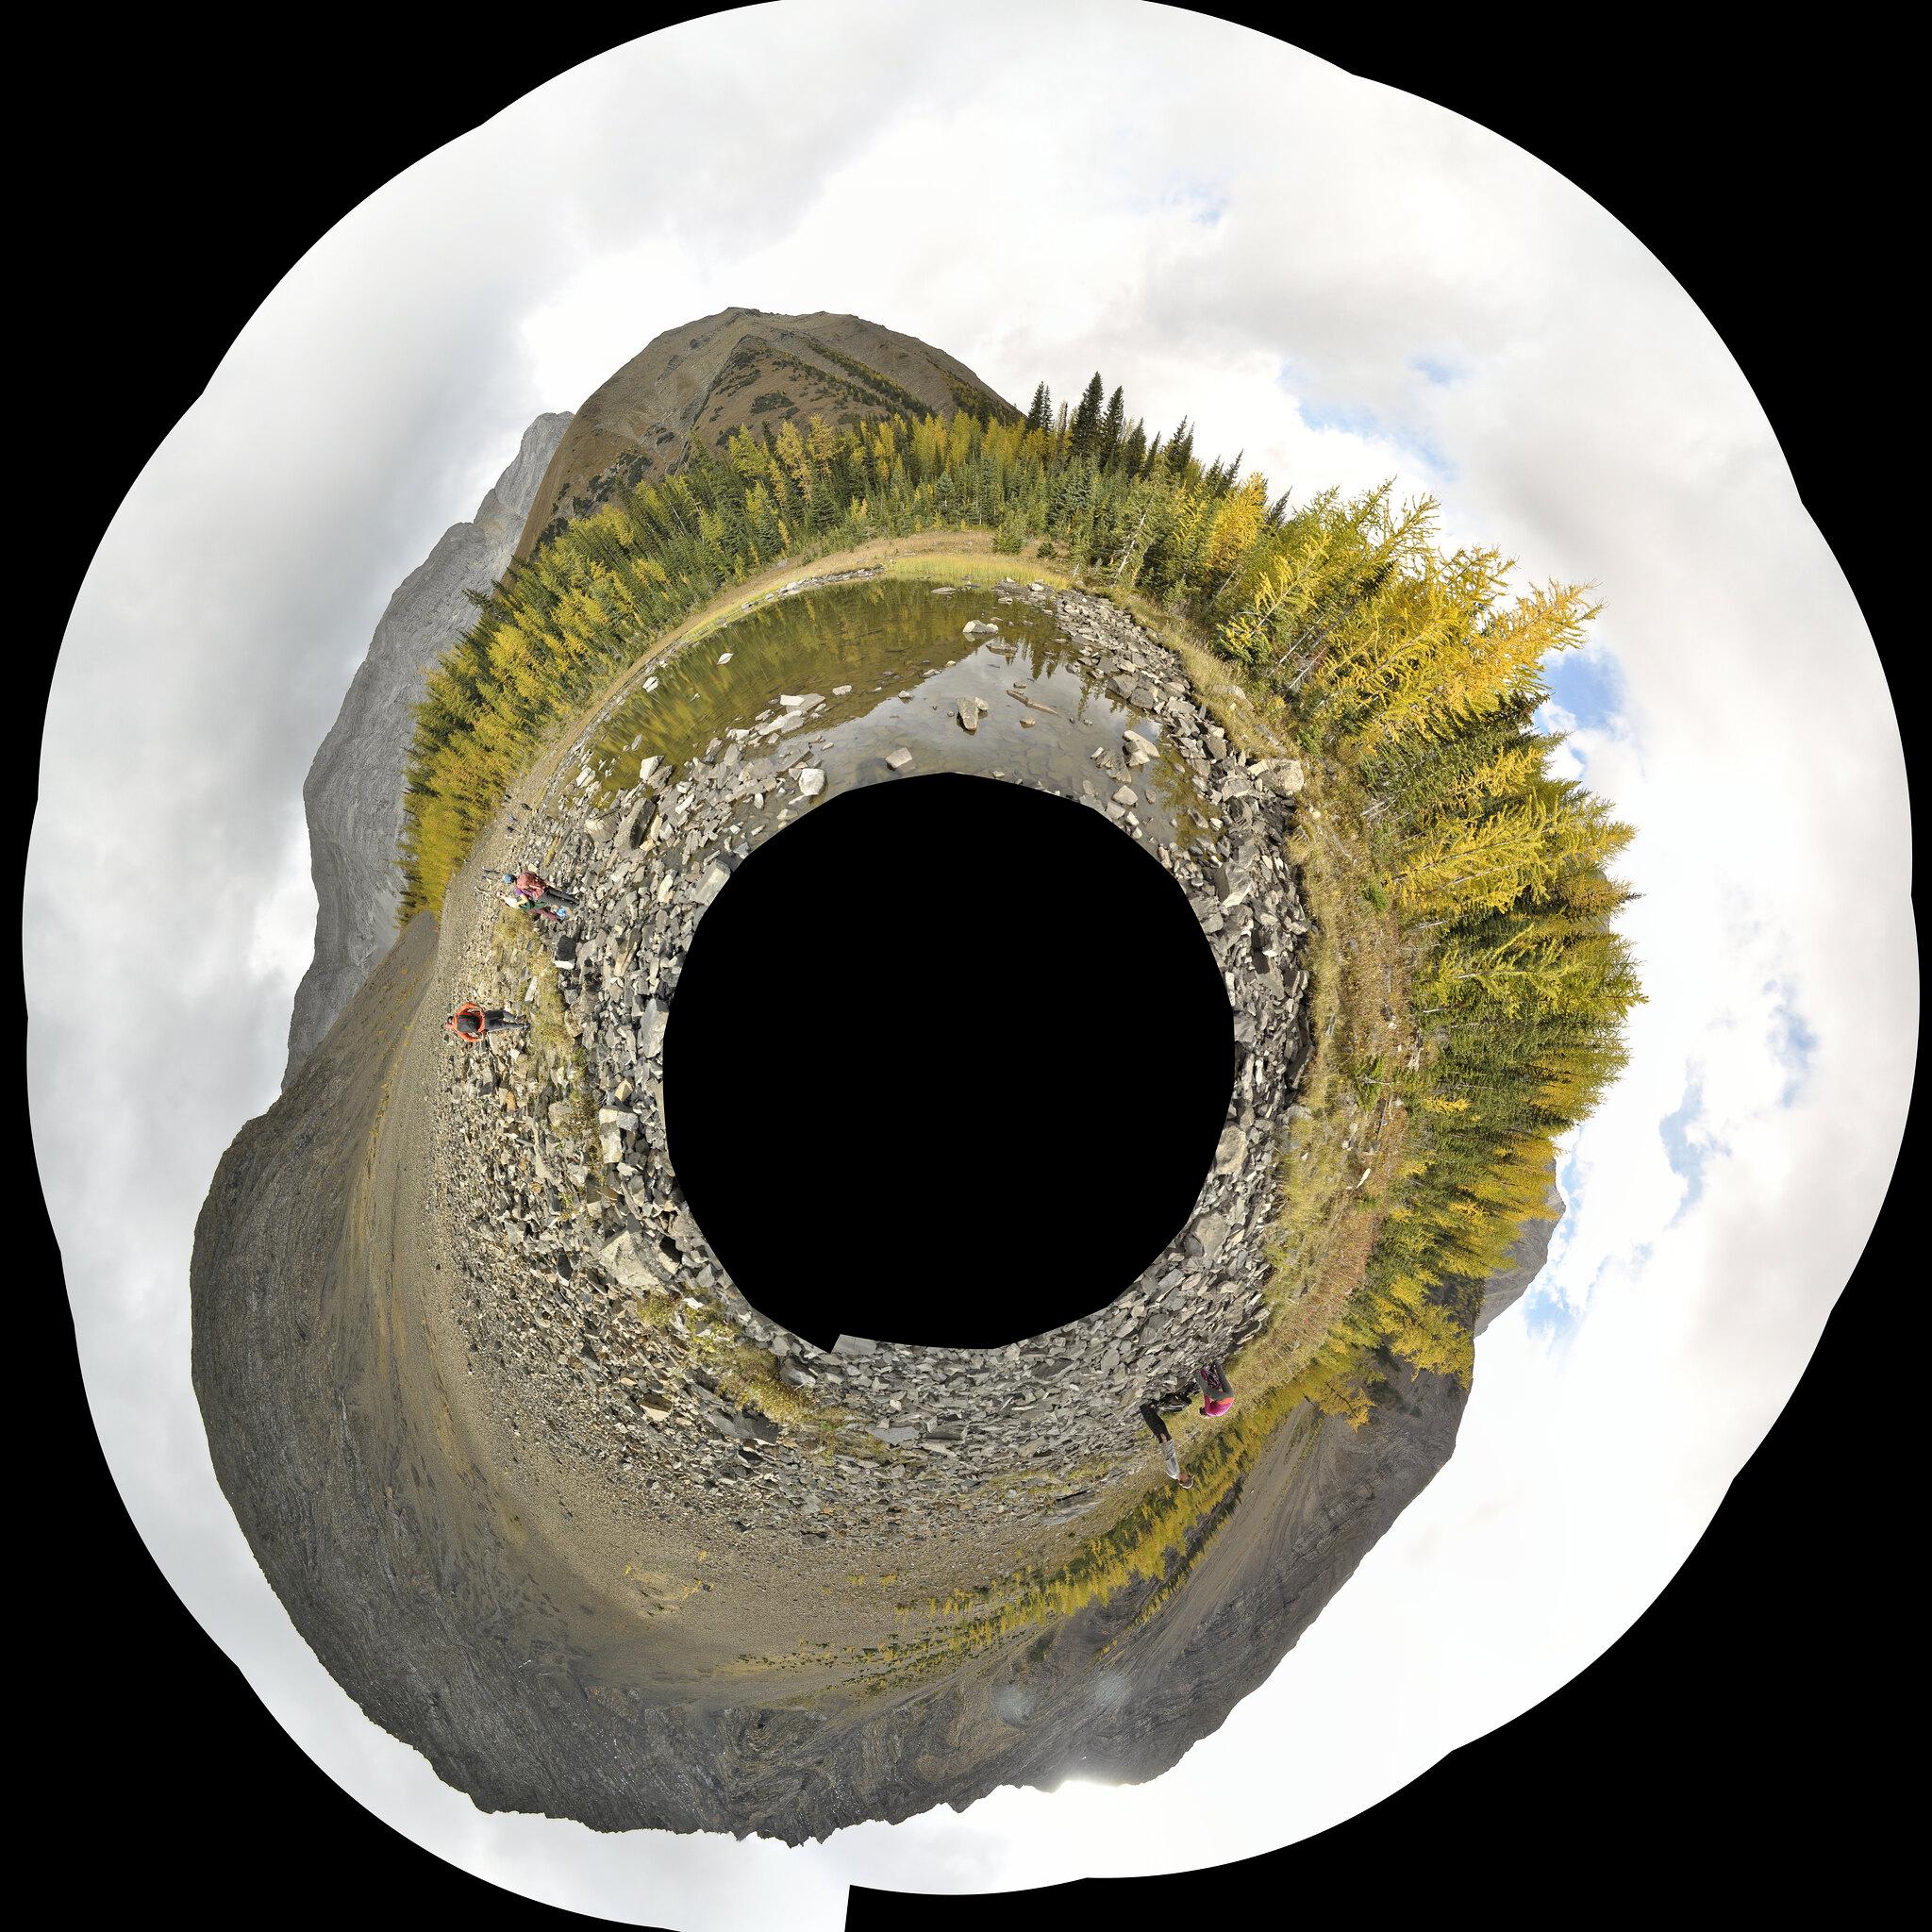 Pseudoplanetoide de Pocaterra Kananaskis